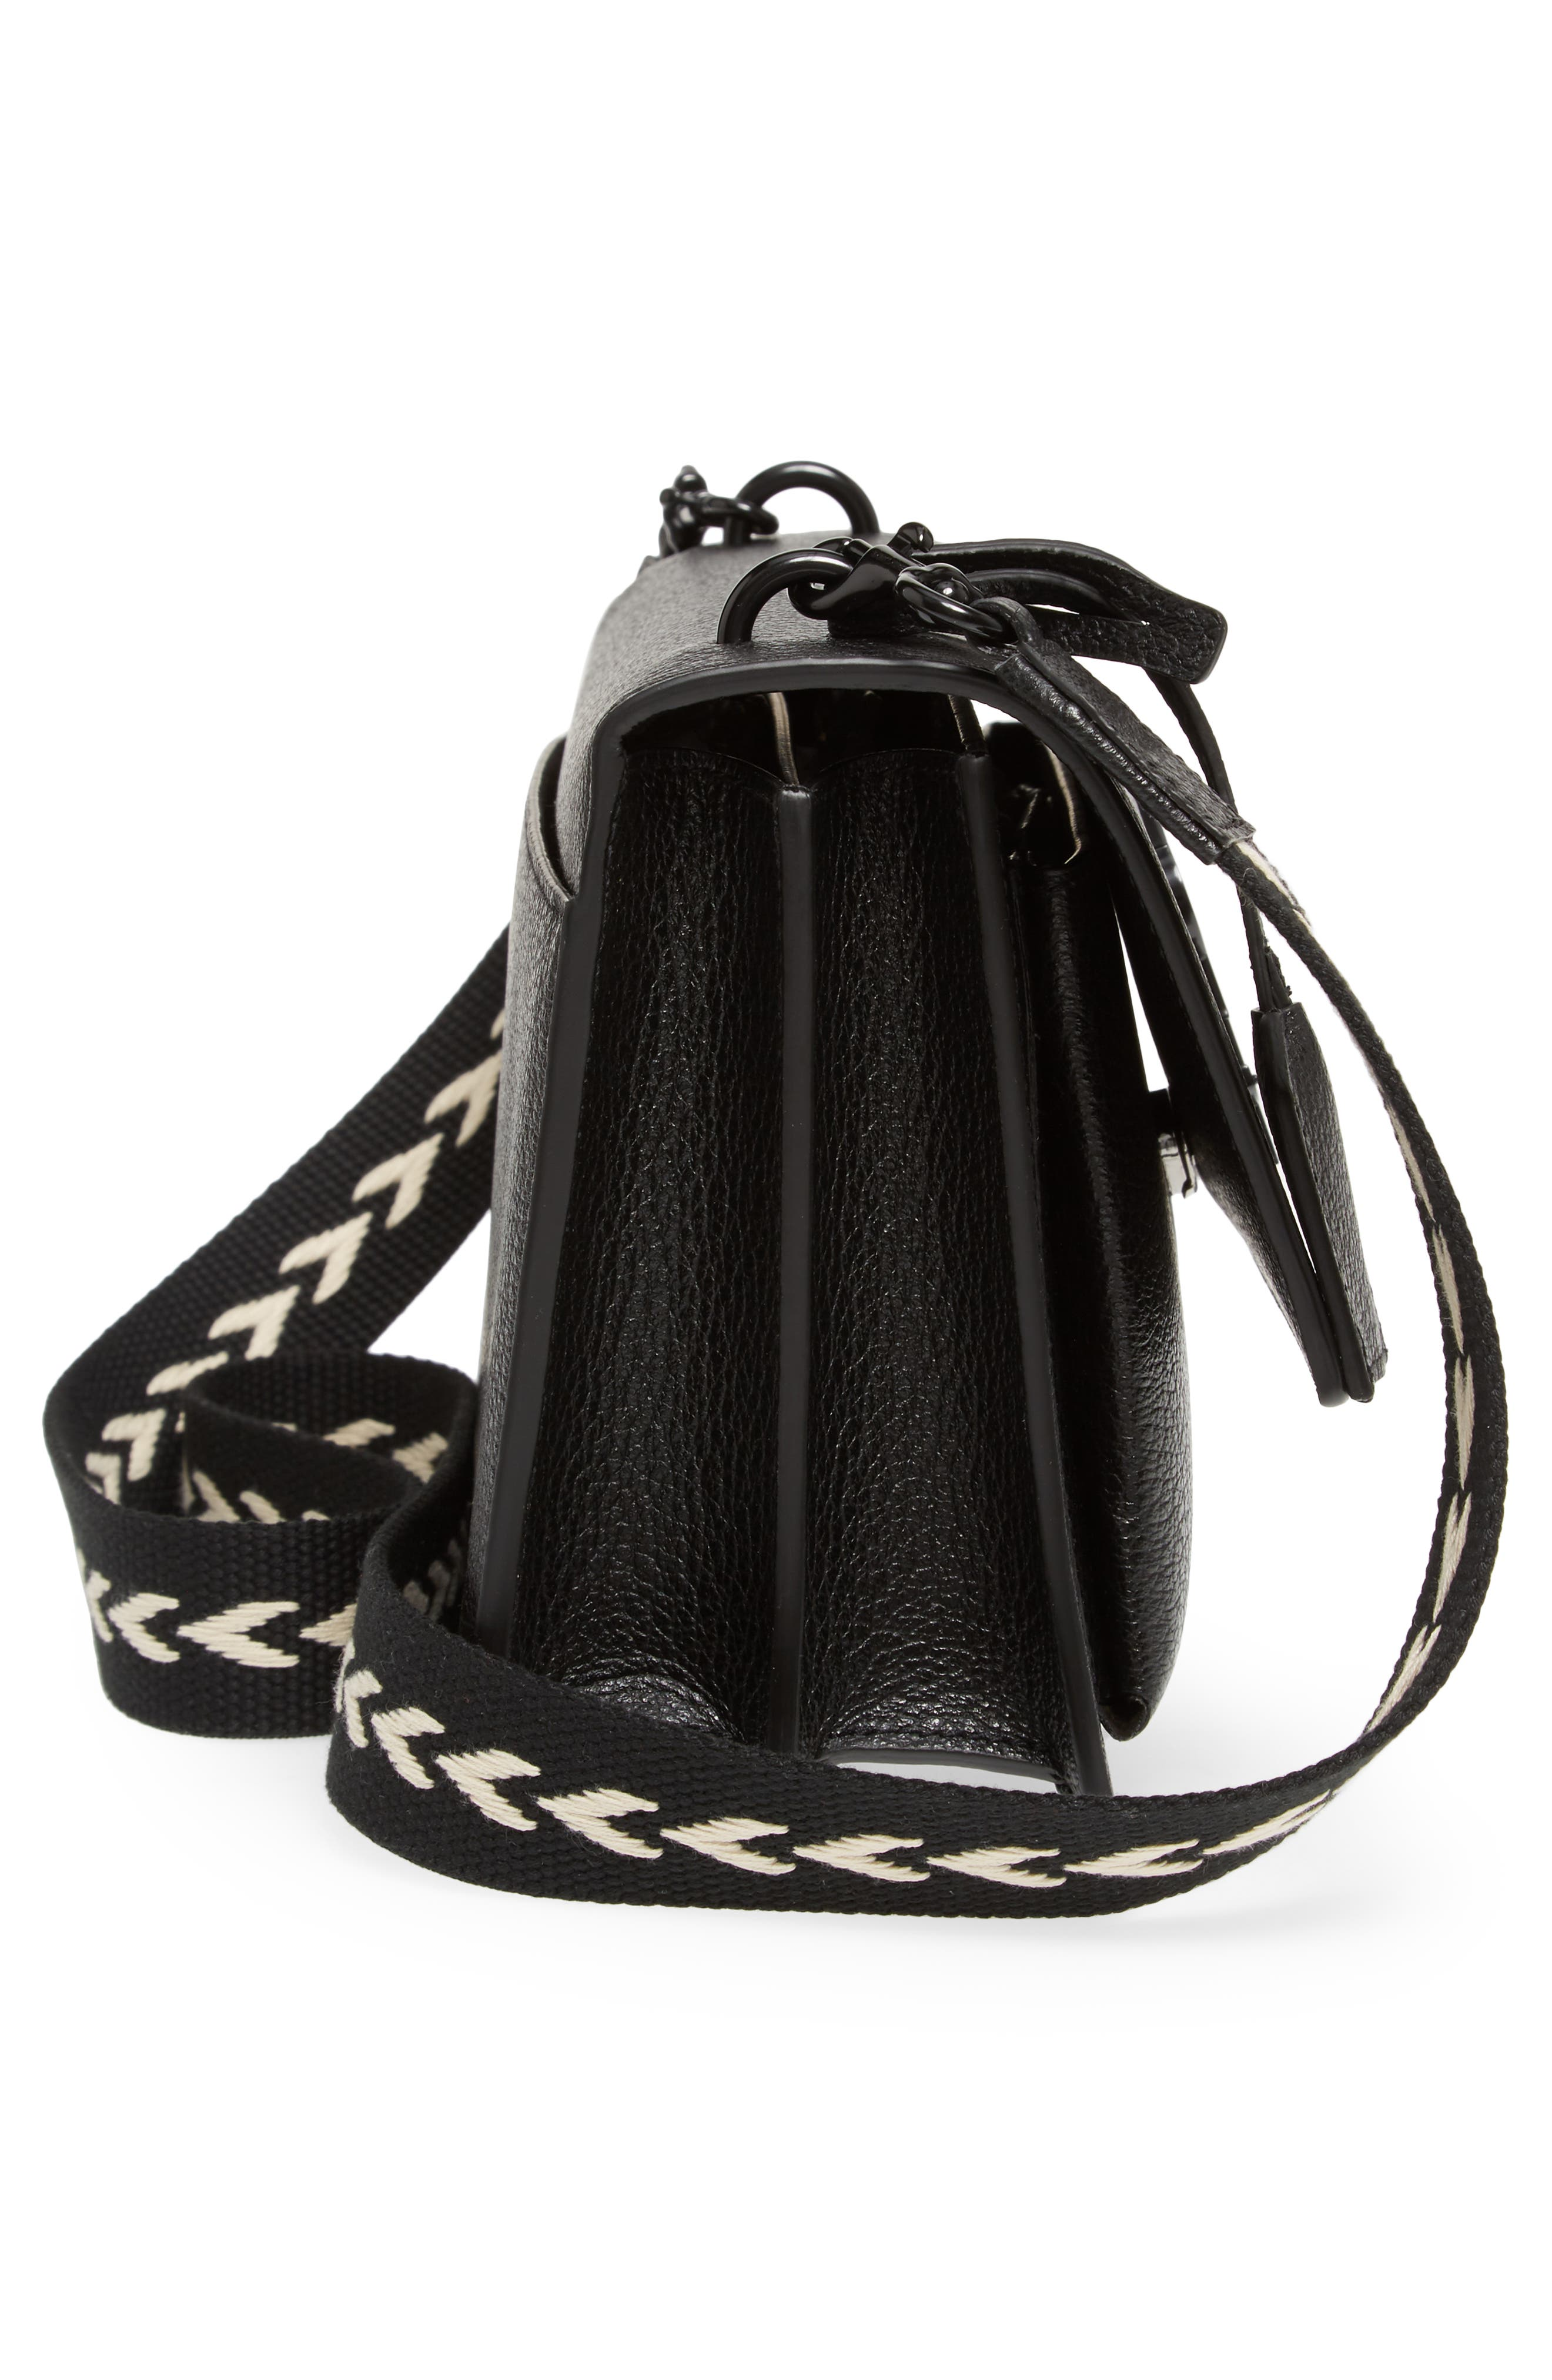 Medium Sunset Calfskin Shoulder Bag with Woven Guitar Strap,                             Alternate thumbnail 5, color,                             Noir